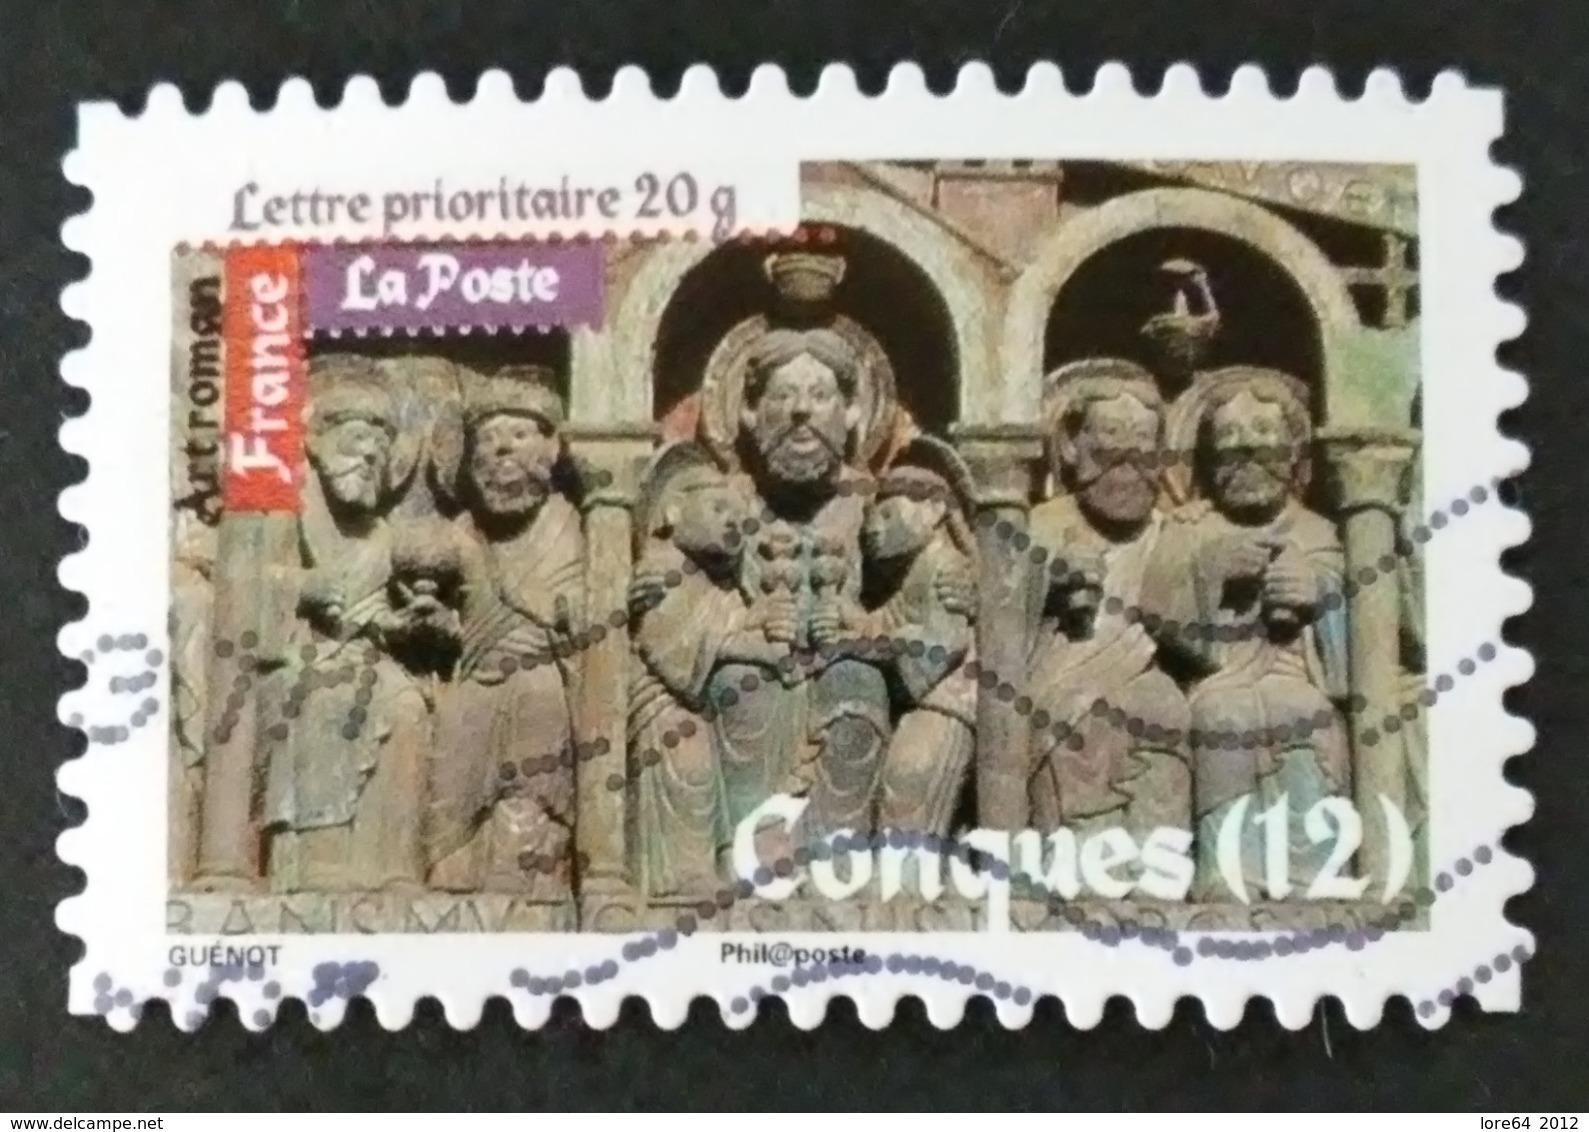 FRANCIA 2010 - 466 - France